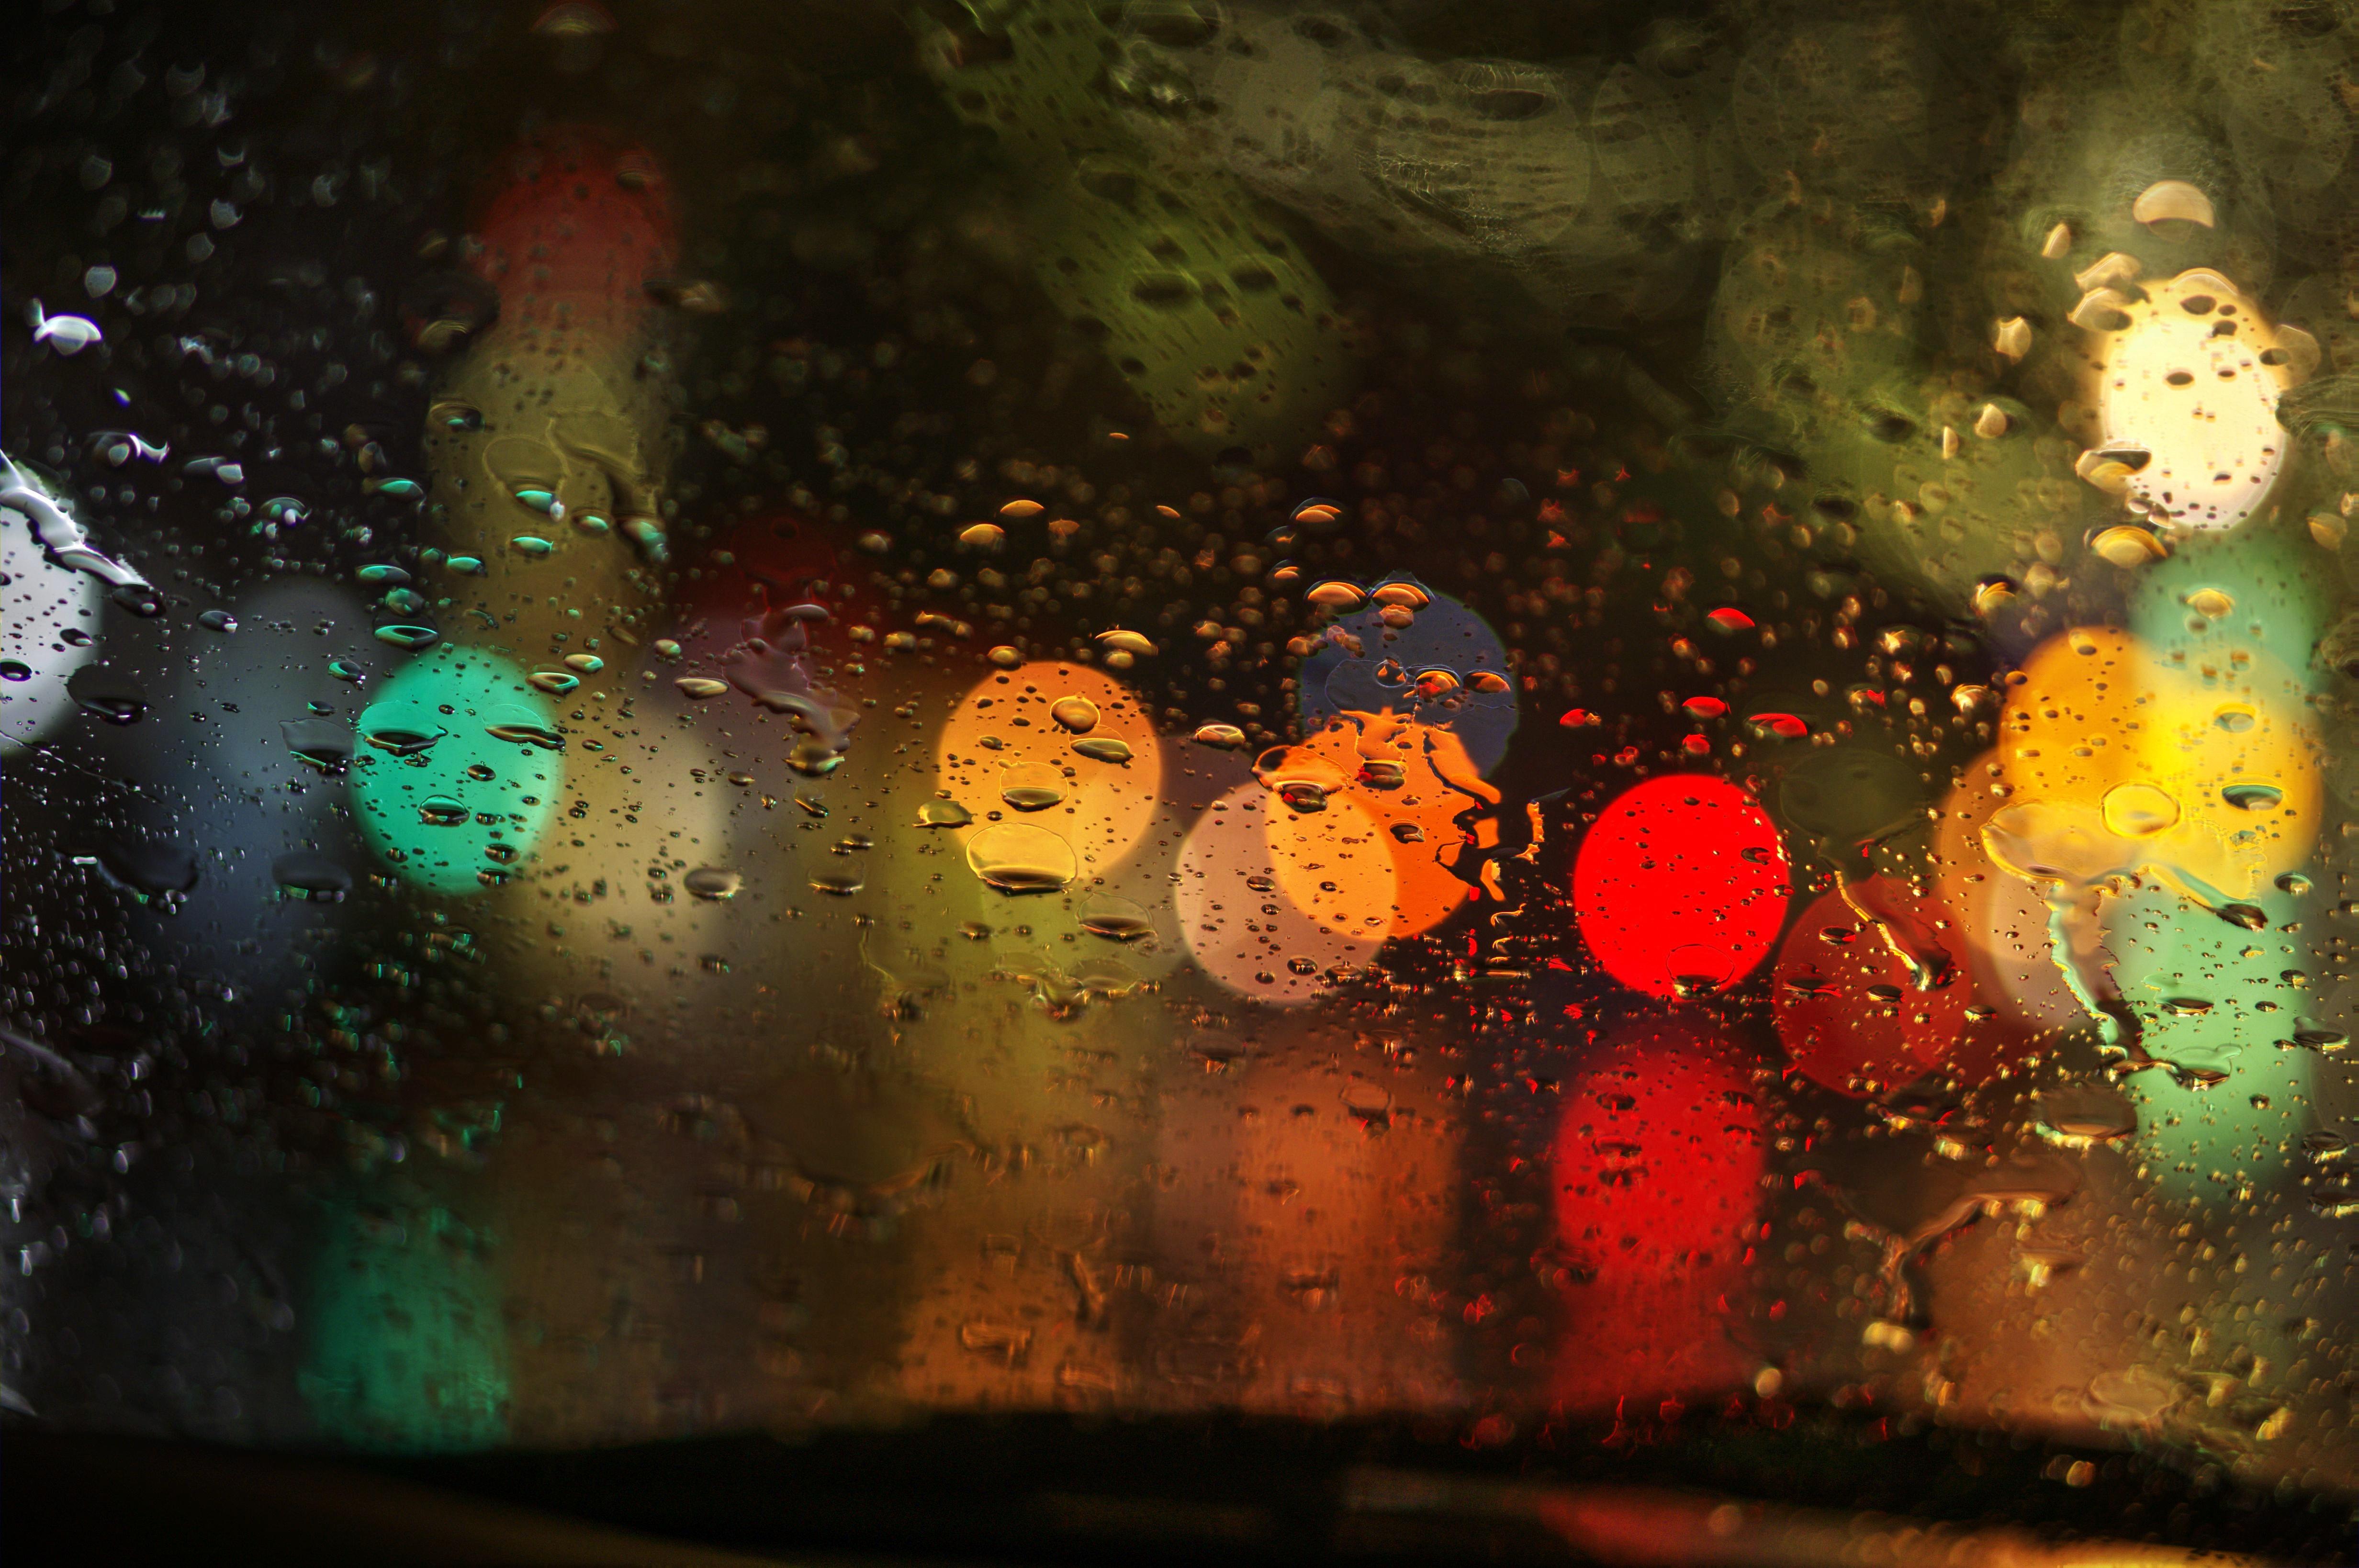 Wallpaper Night Abstract Water Reflection Rain Yellow